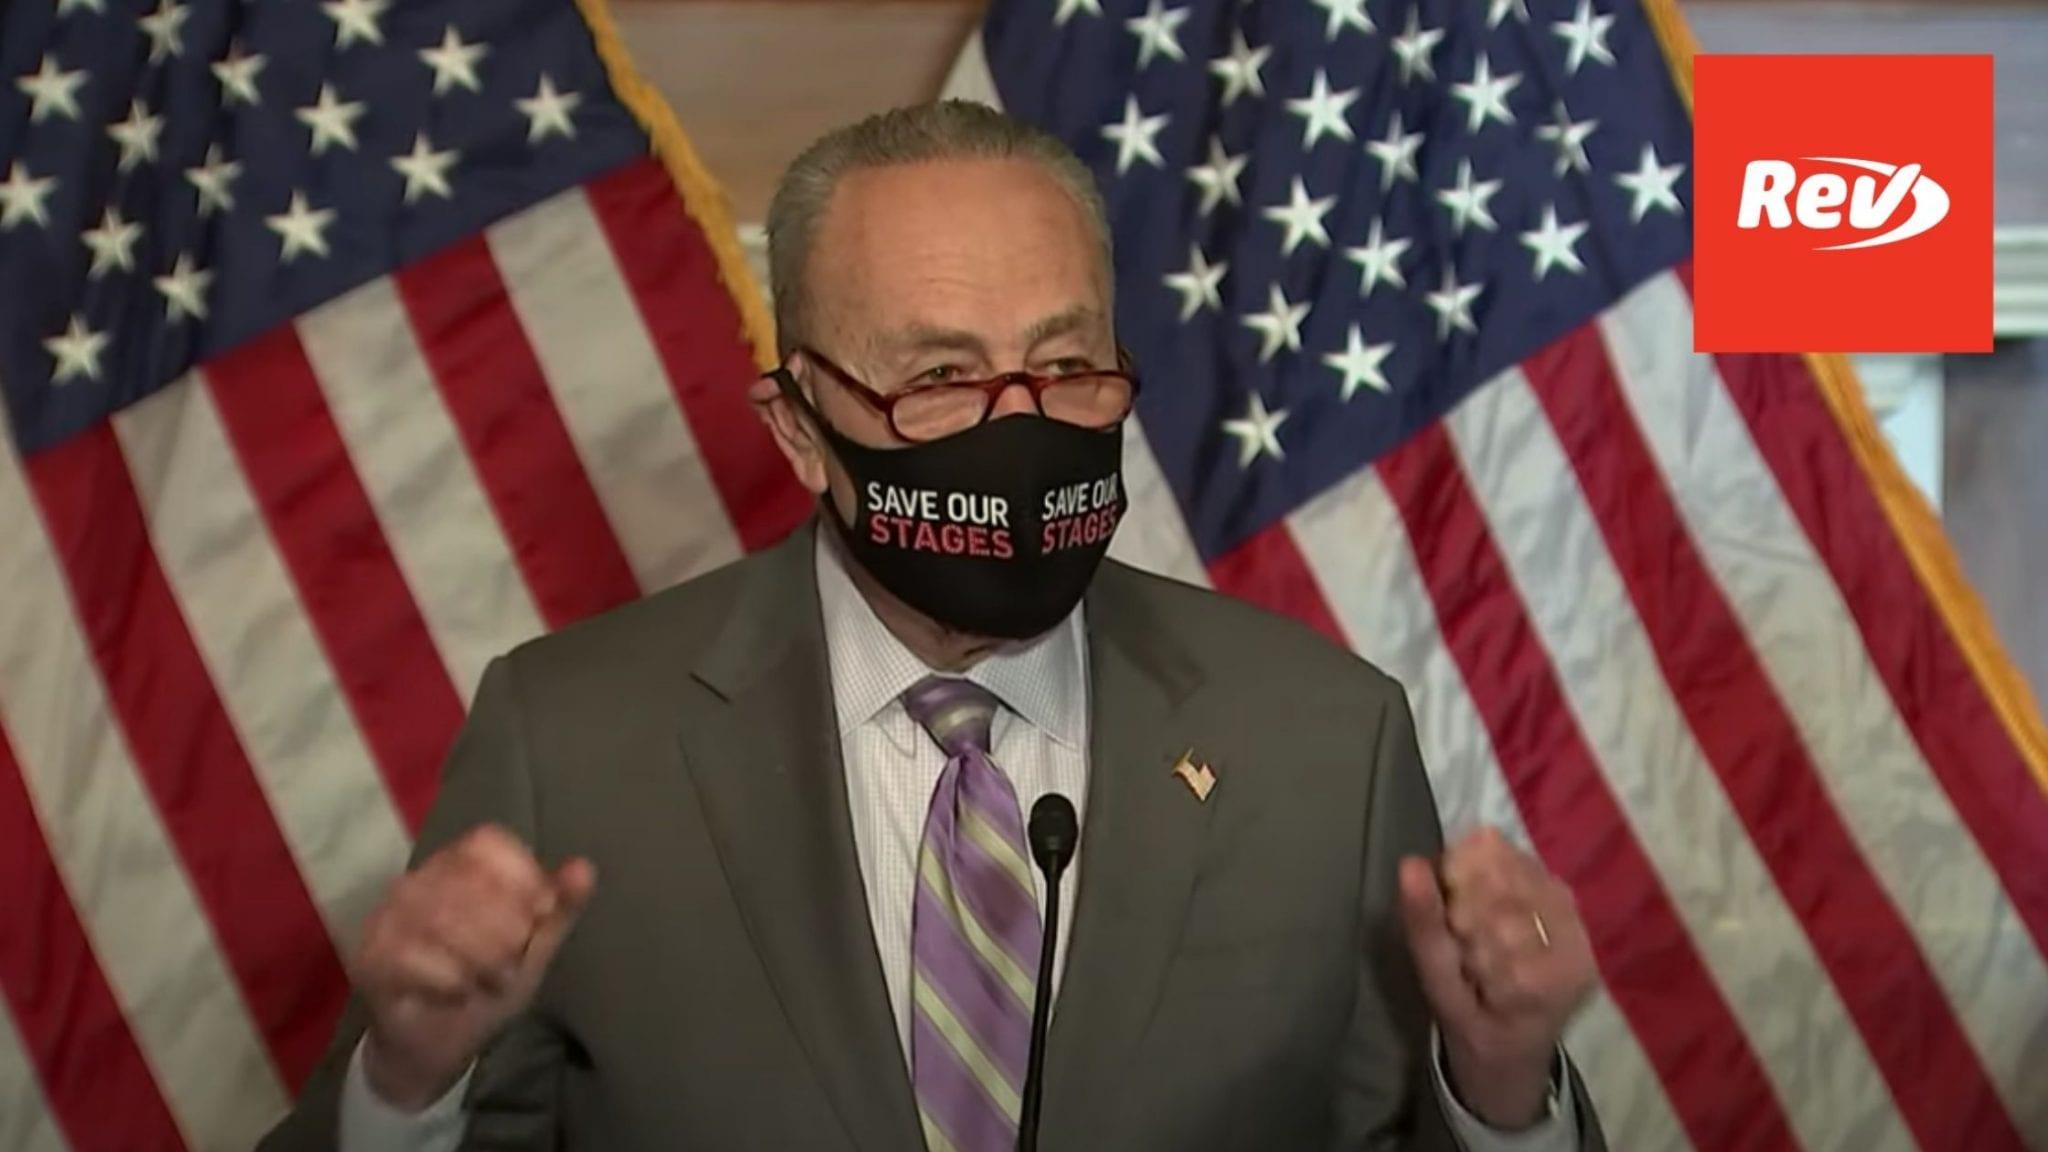 Schumer, Senate Democrats Press Conference on COVID-19 Relief Package Transcript February 9